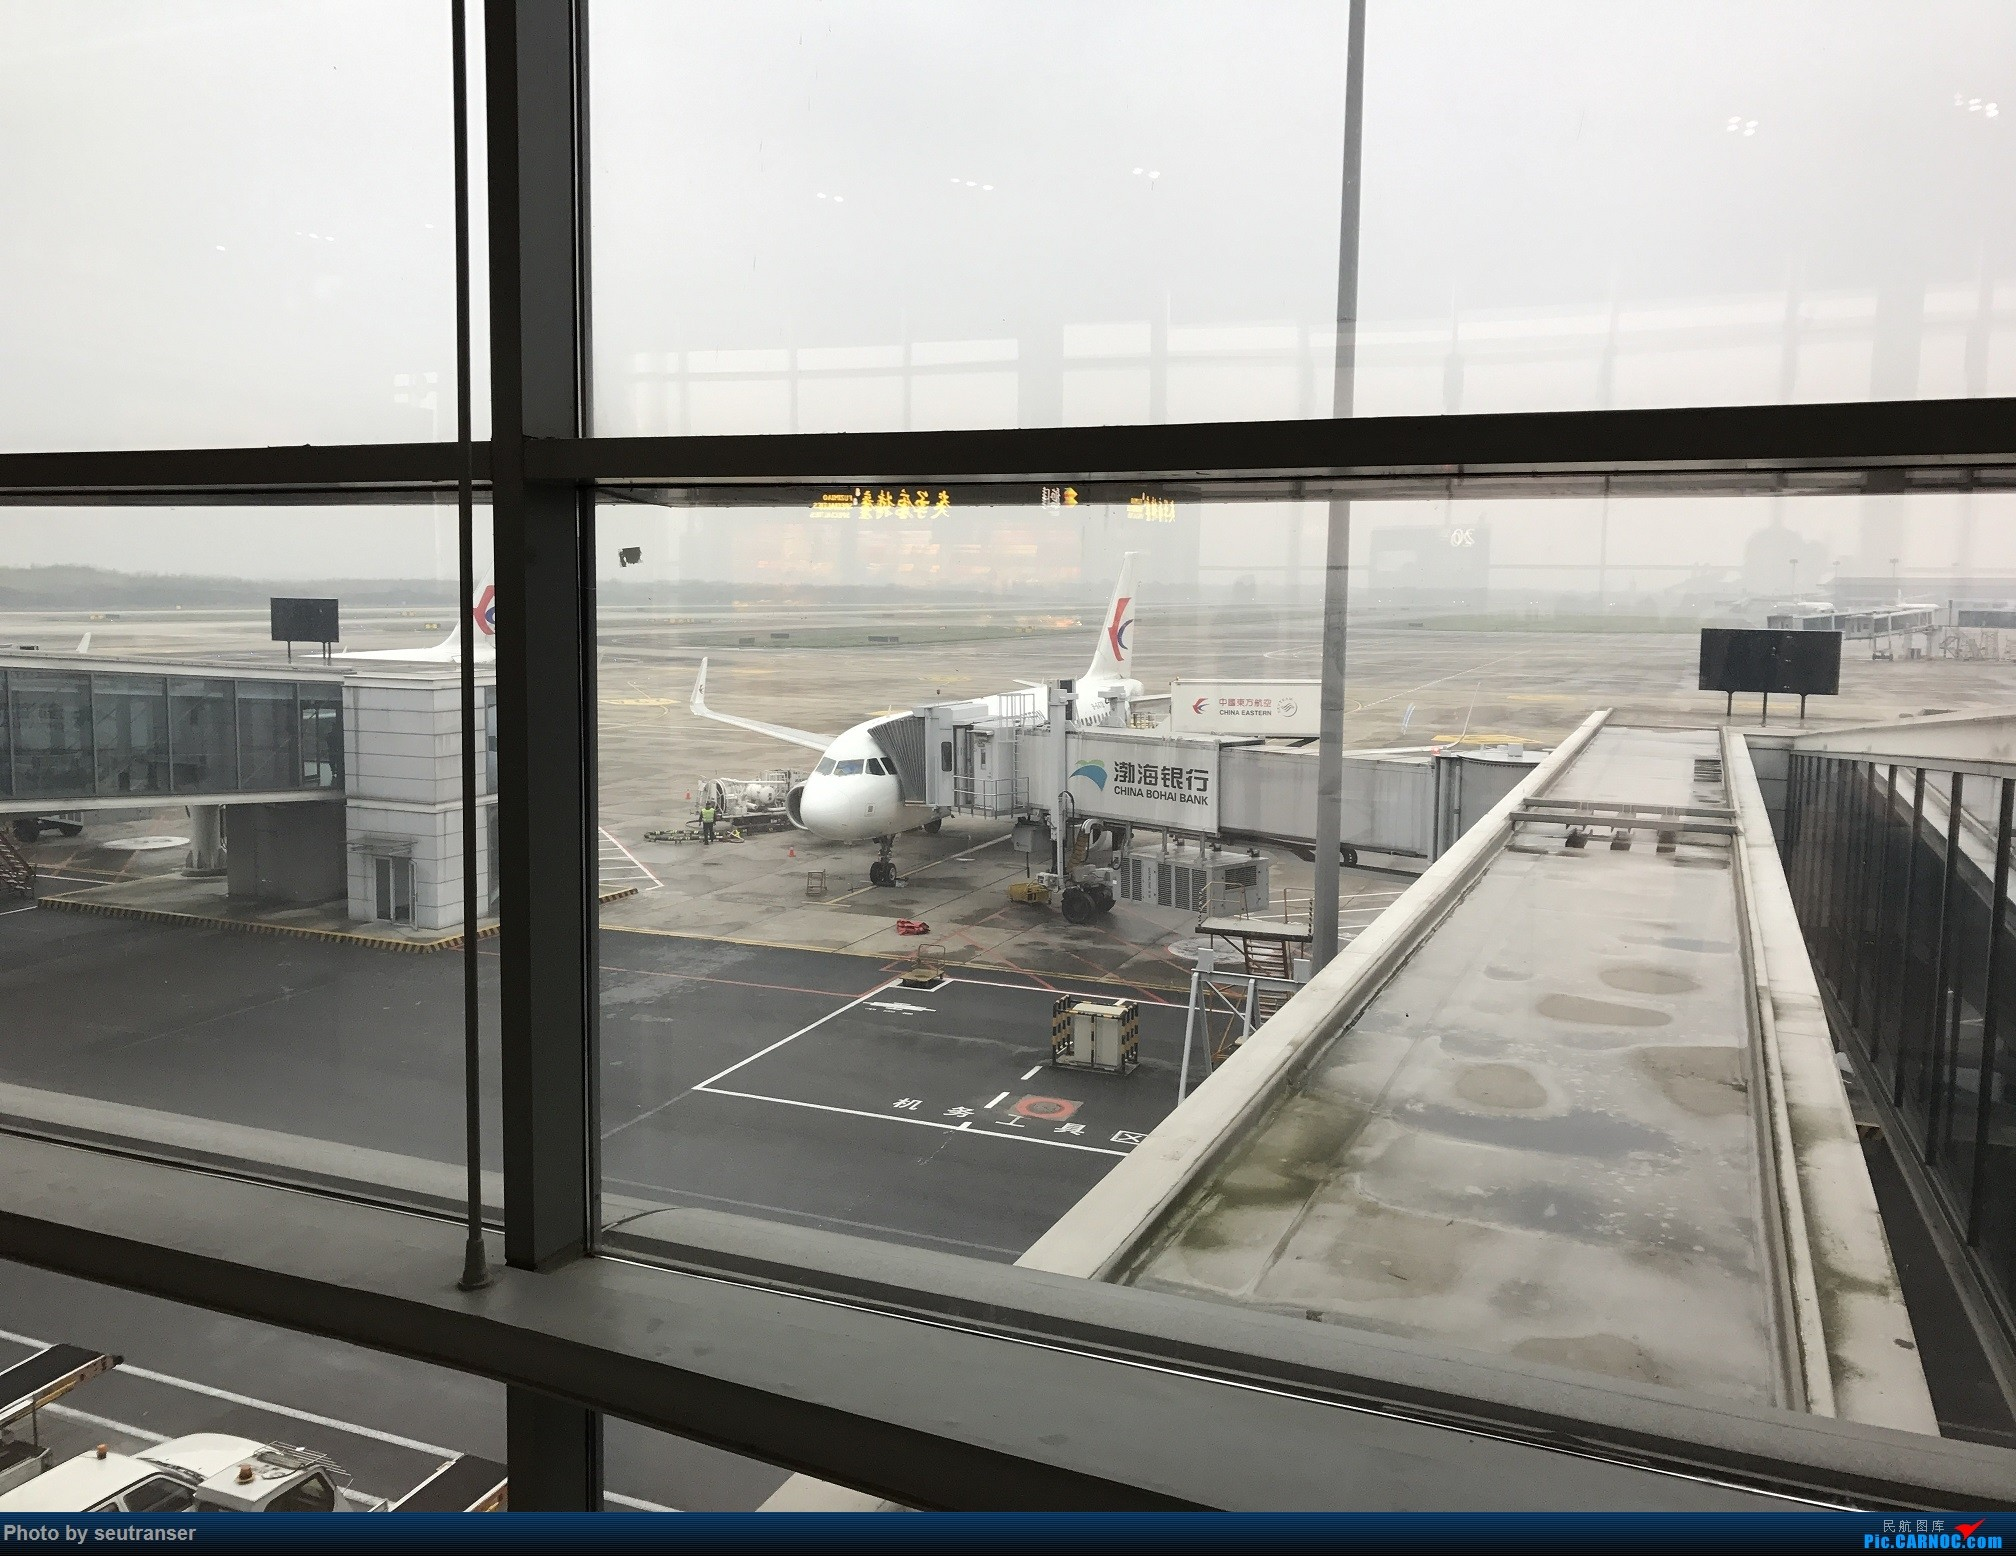 Re:[原创]迟到一年的游记,记第一次出国游—日本 AIRBUS A319 B-6472 南京禄口国际机场